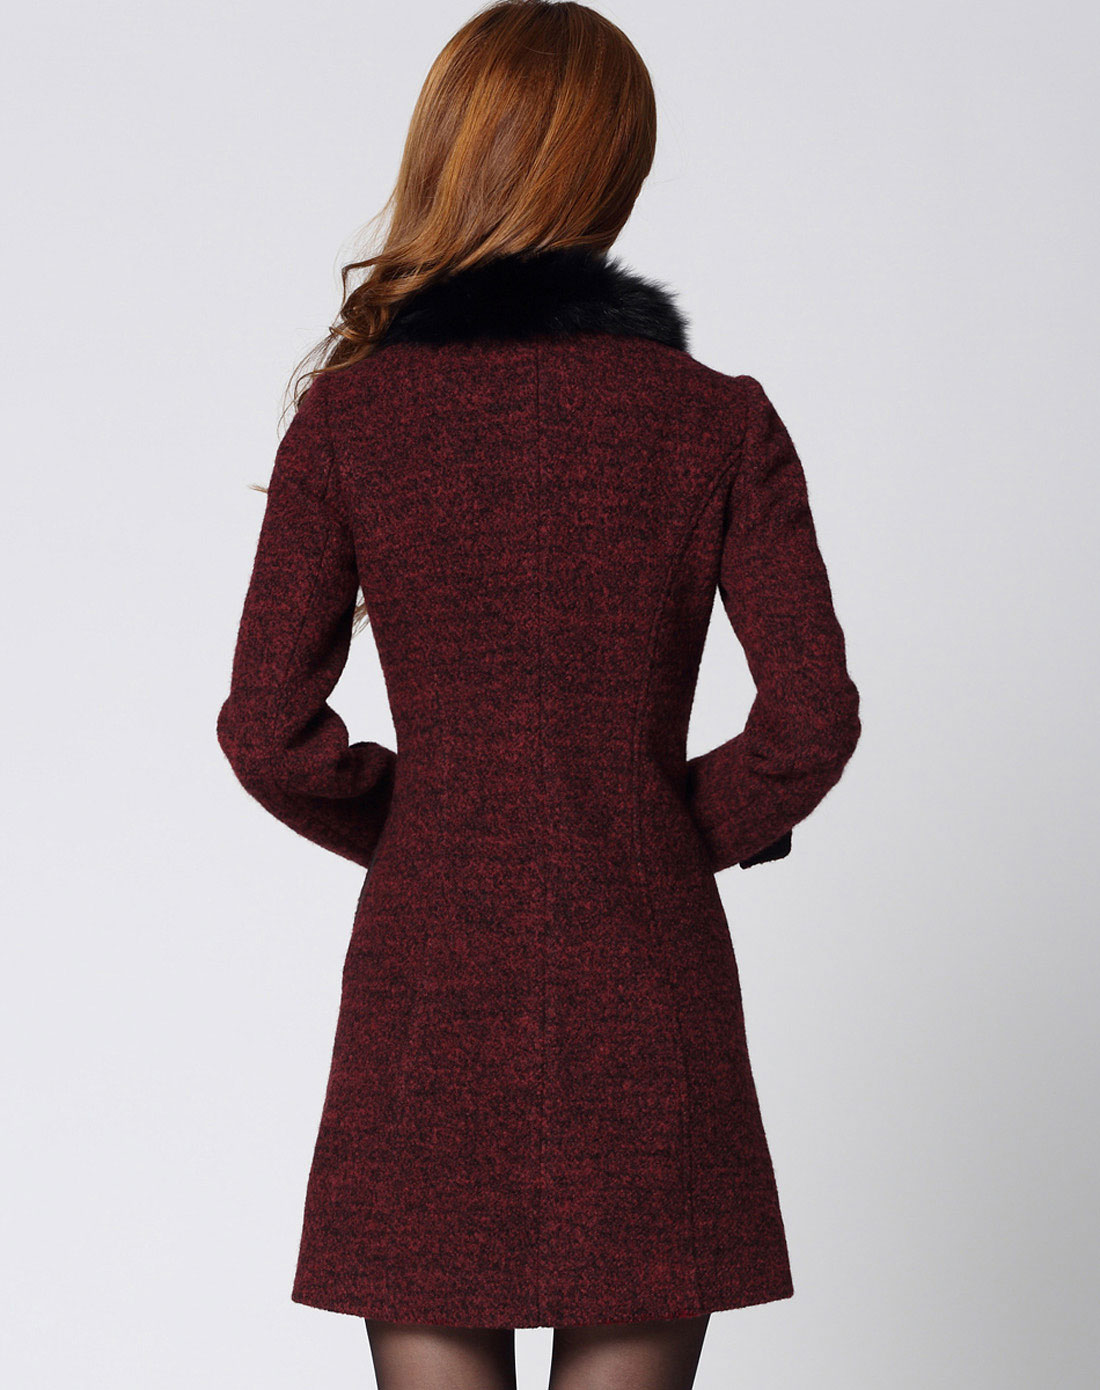 sa女款枣红色含羊毛大衣sd210184500a